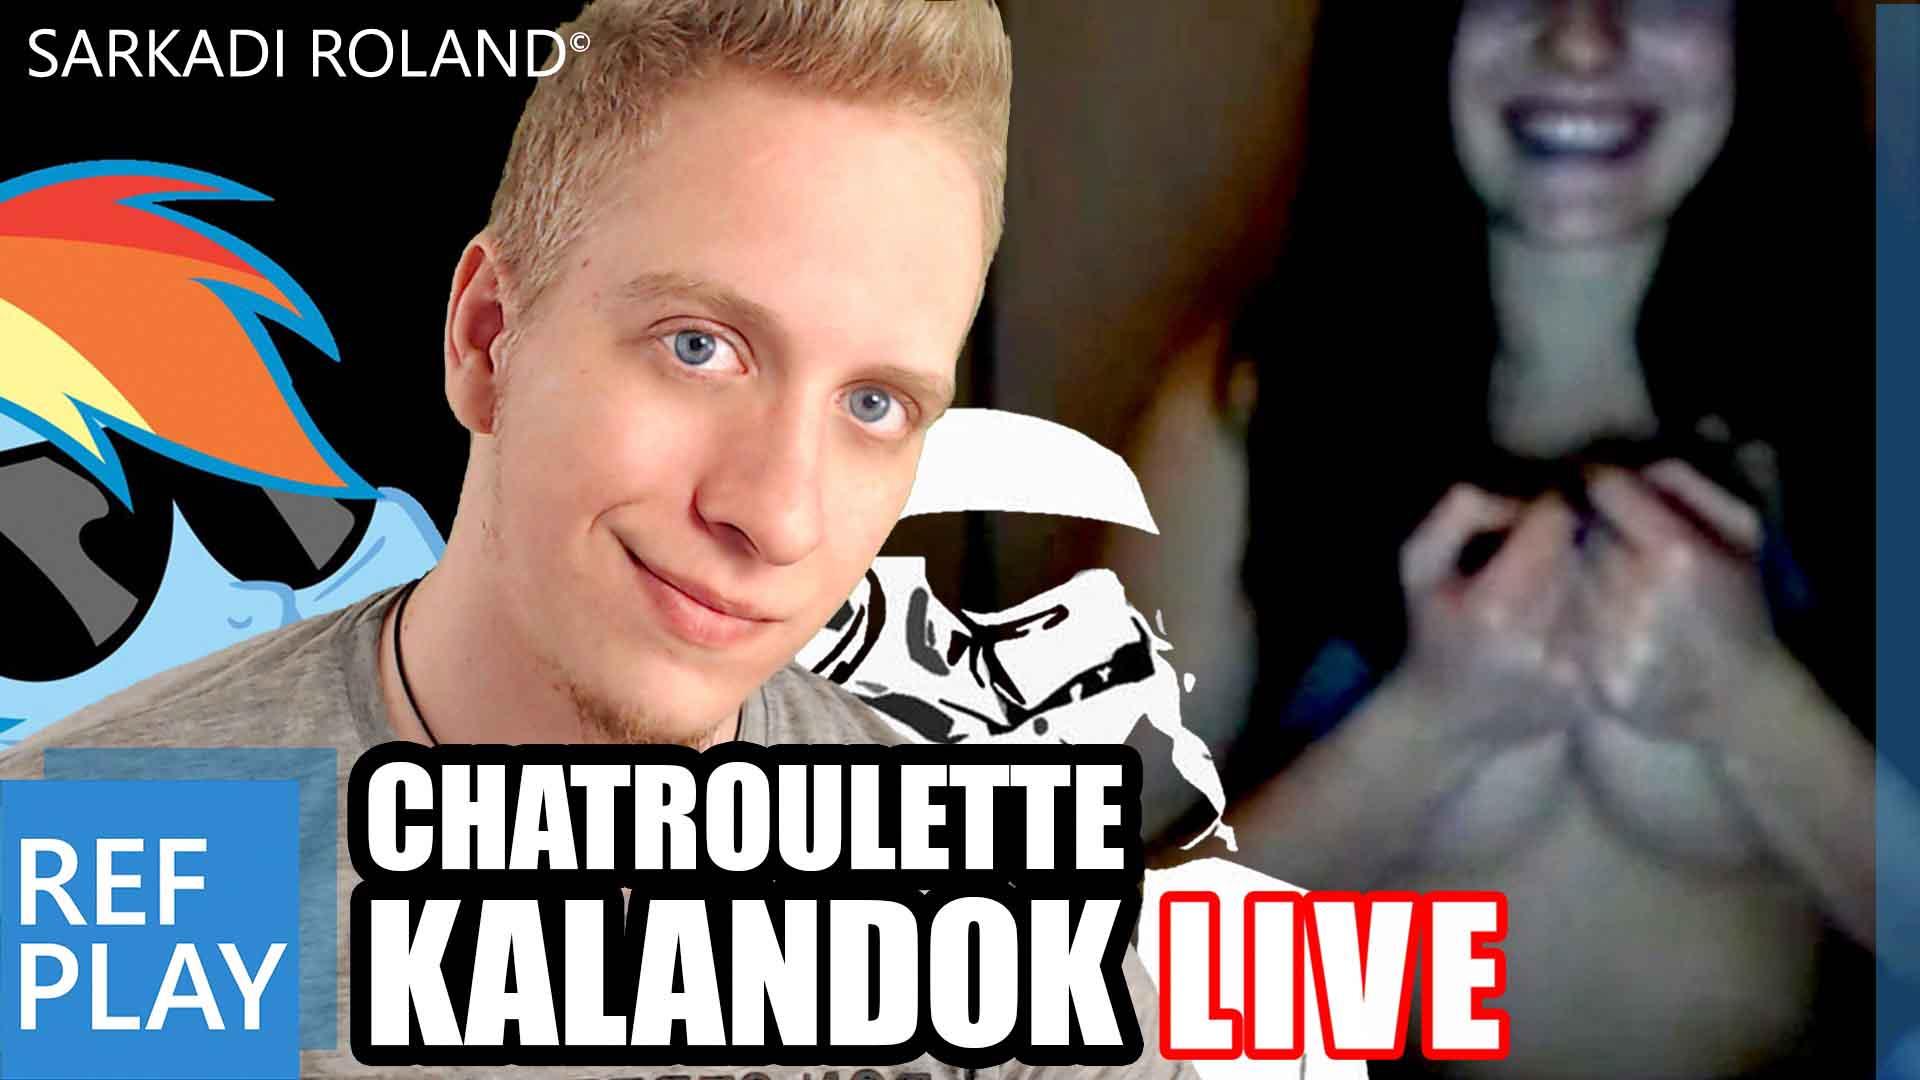 TOLJUK!! | CHATROULETTEKALANDOK | REFPLAY